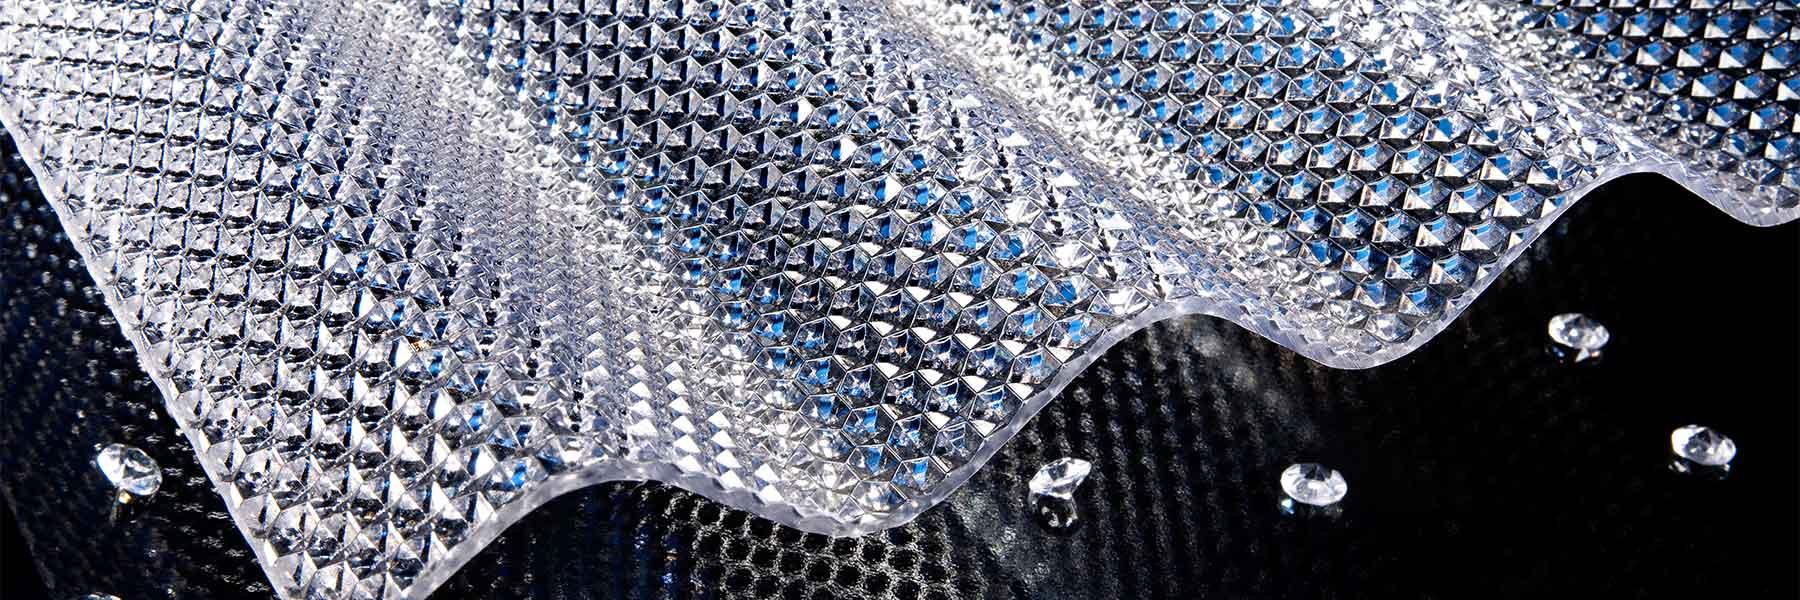 Slider Wellplatten Polycarbonat Fricarb Forte Wabe Farblos